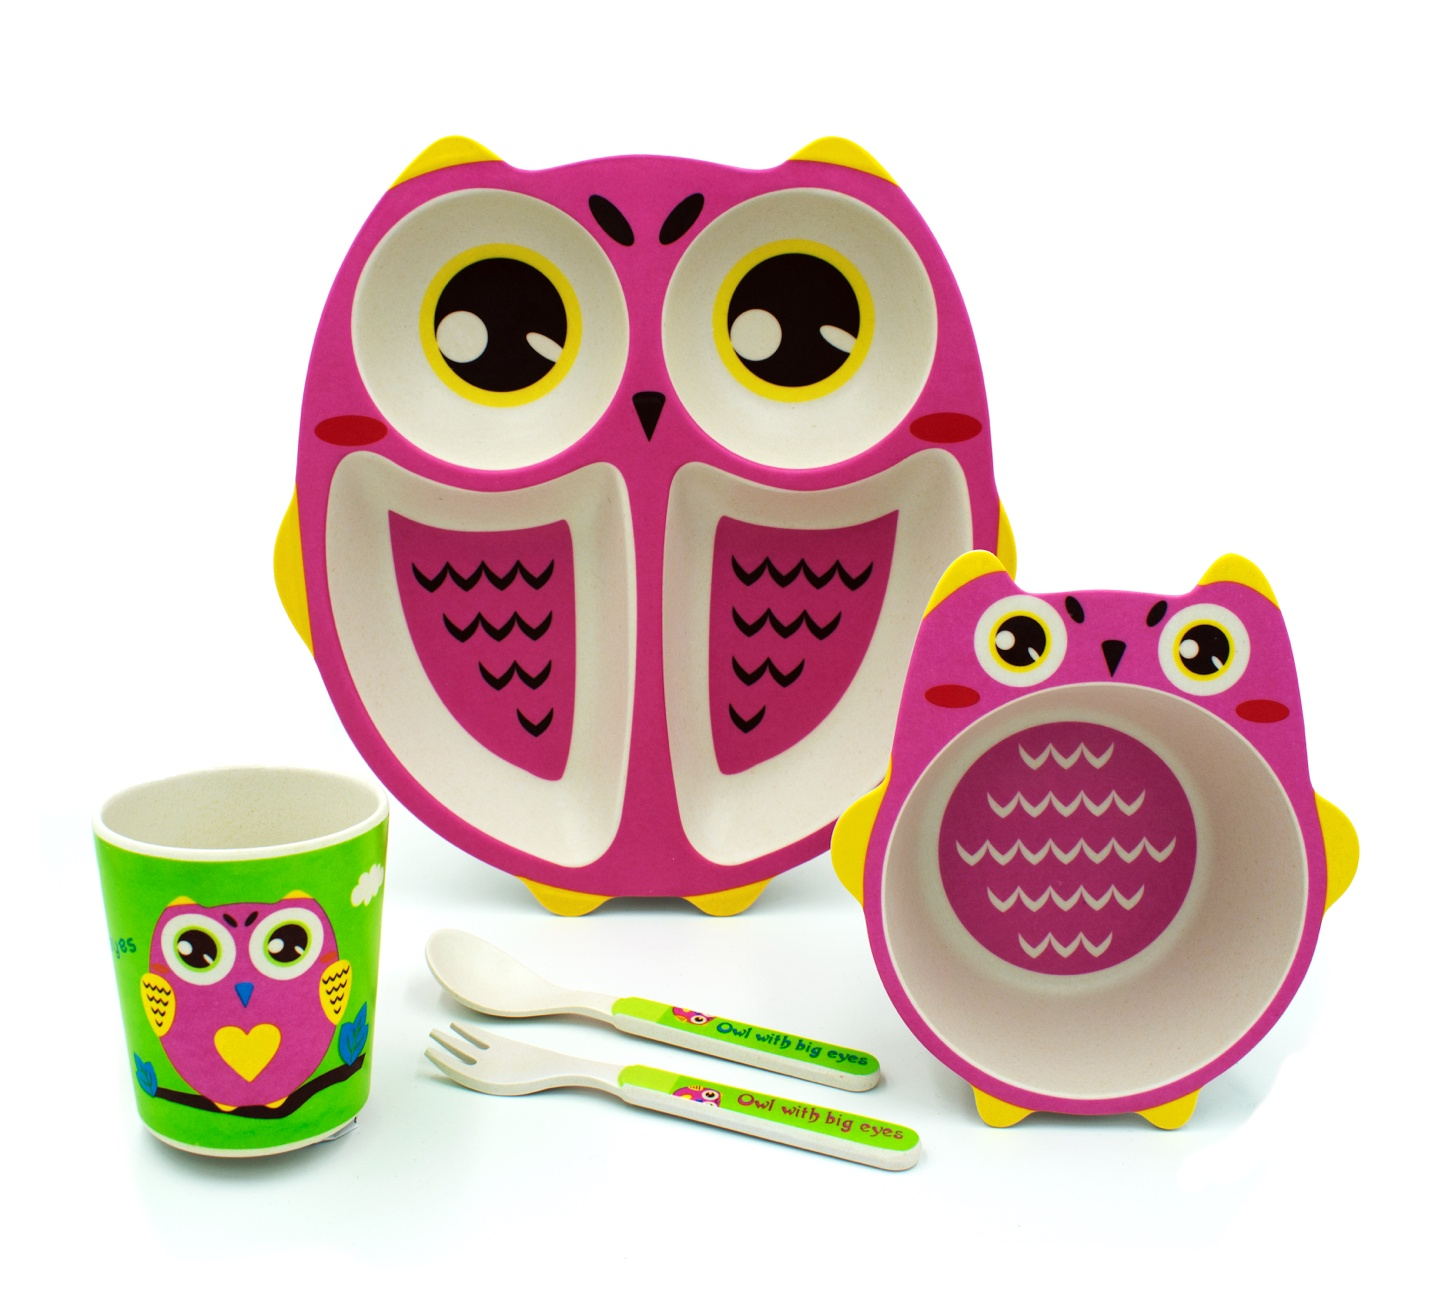 Комплект посуды Baozhiyu Розовая сова